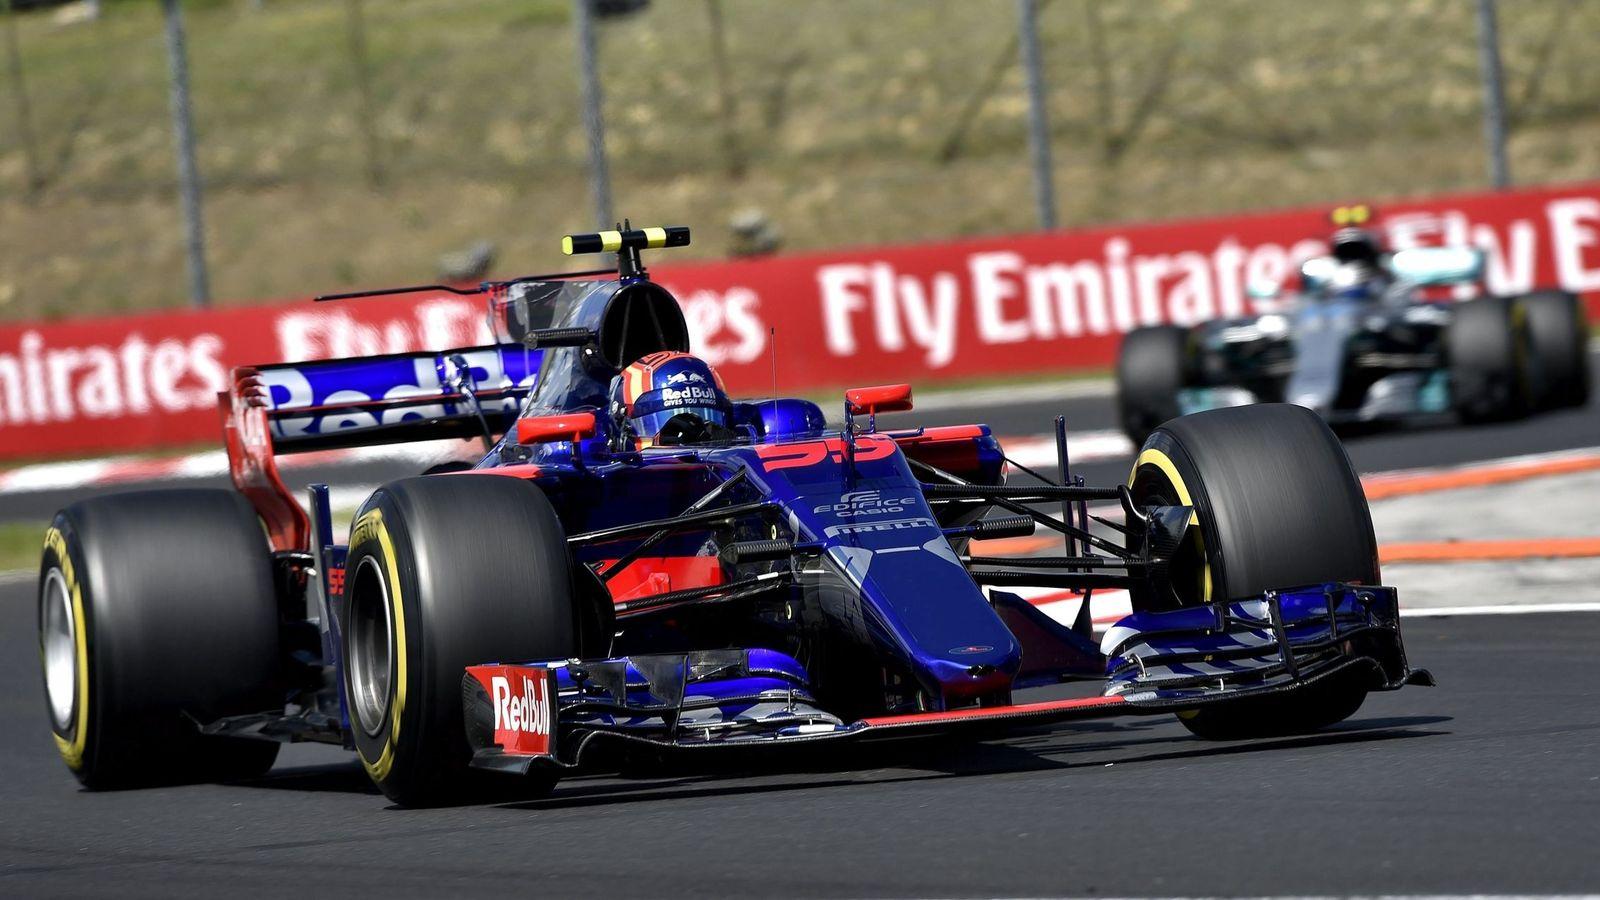 Foto: Sainz, al volante del Toro Rosso en Hungaroring. (EFE)